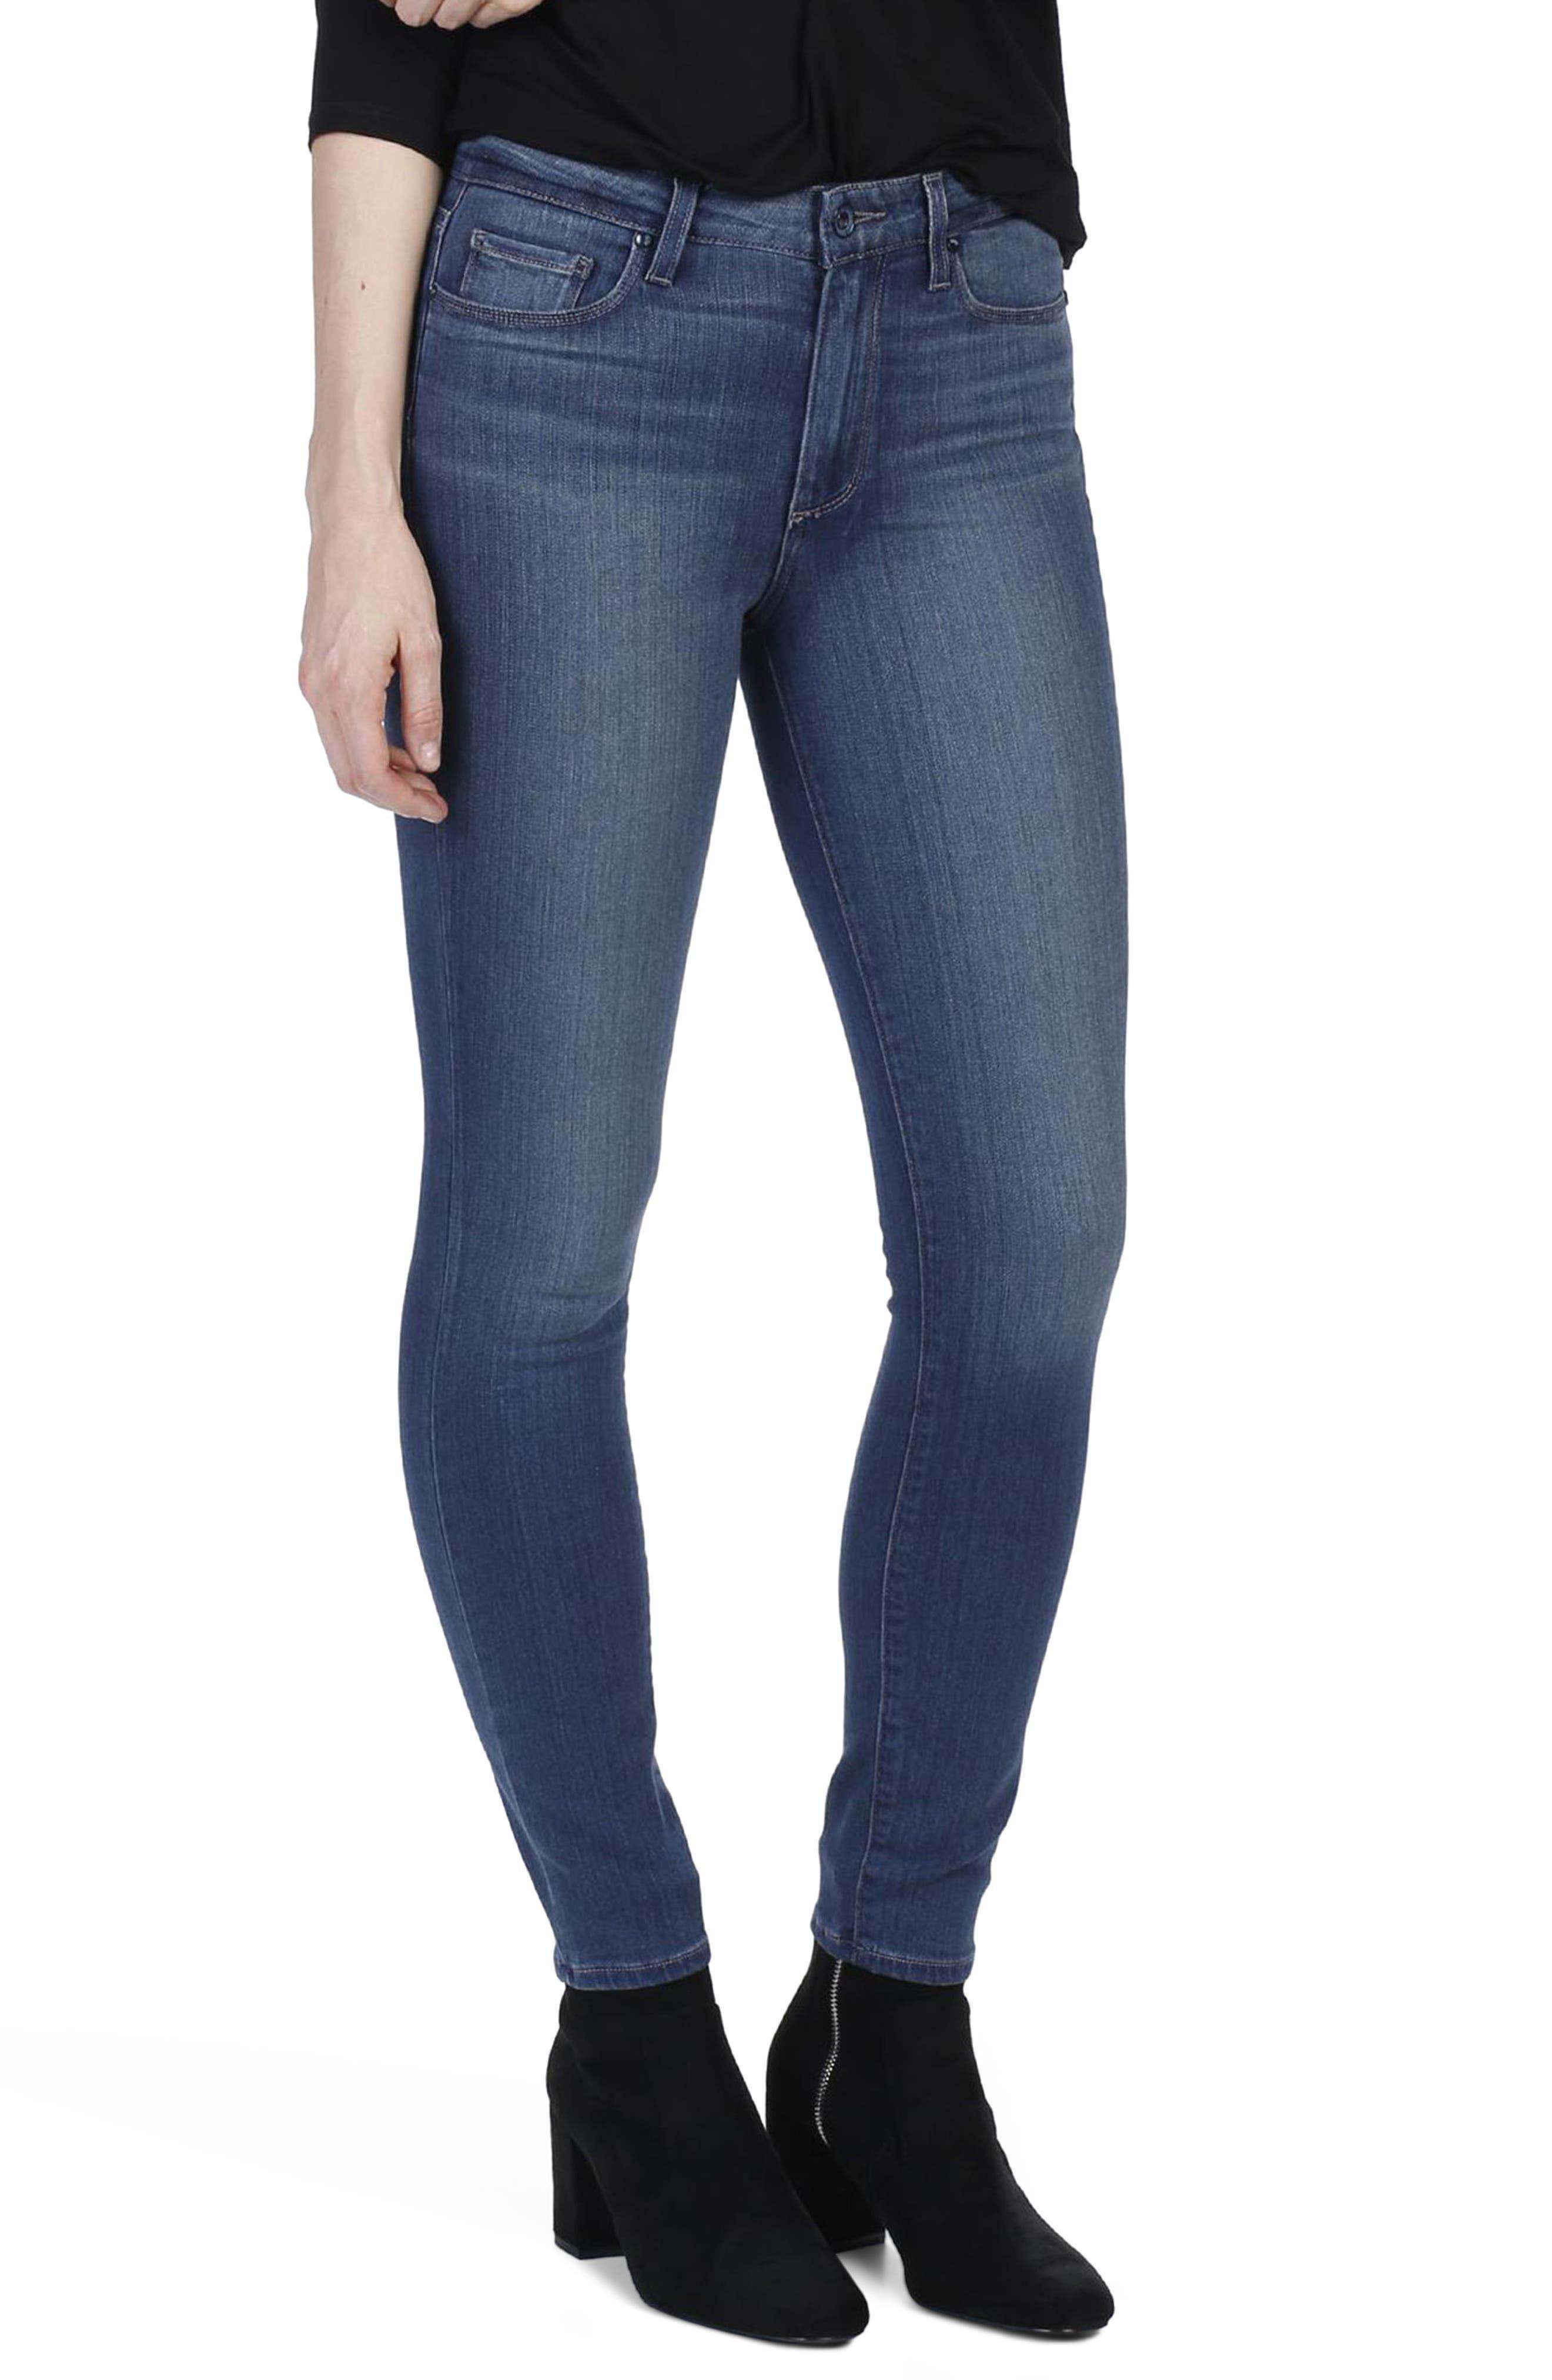 Transcend - Hoxton High Waist Ankle Skinny Jeans,                         Main,                         color, Vida